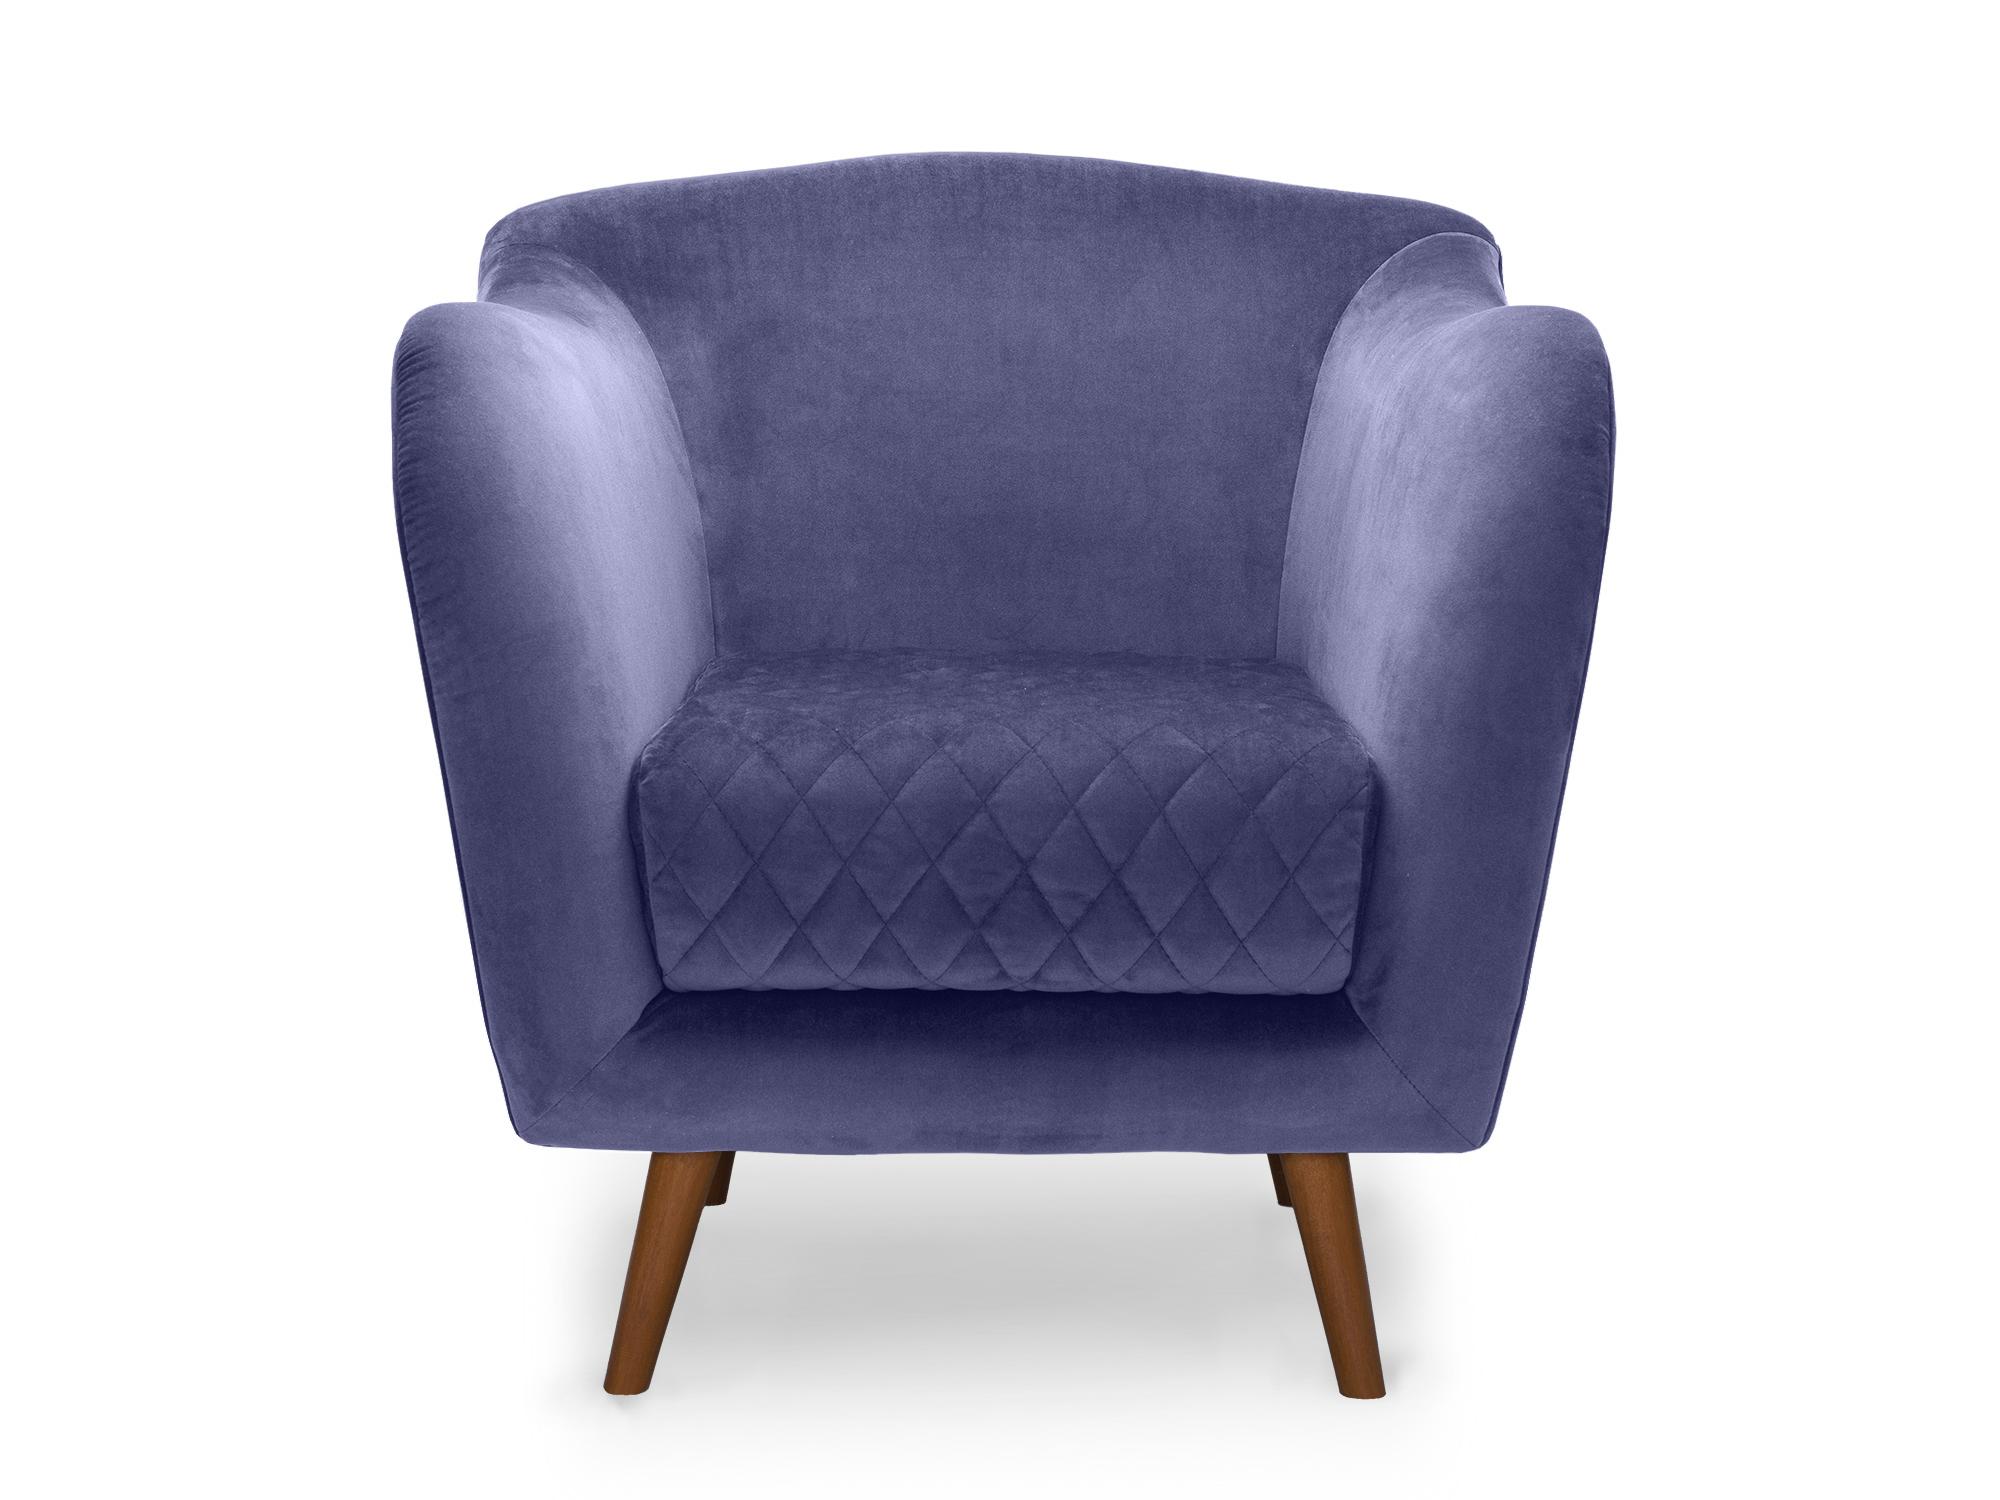 Кресло MyFurnish 15435640 от thefurnish